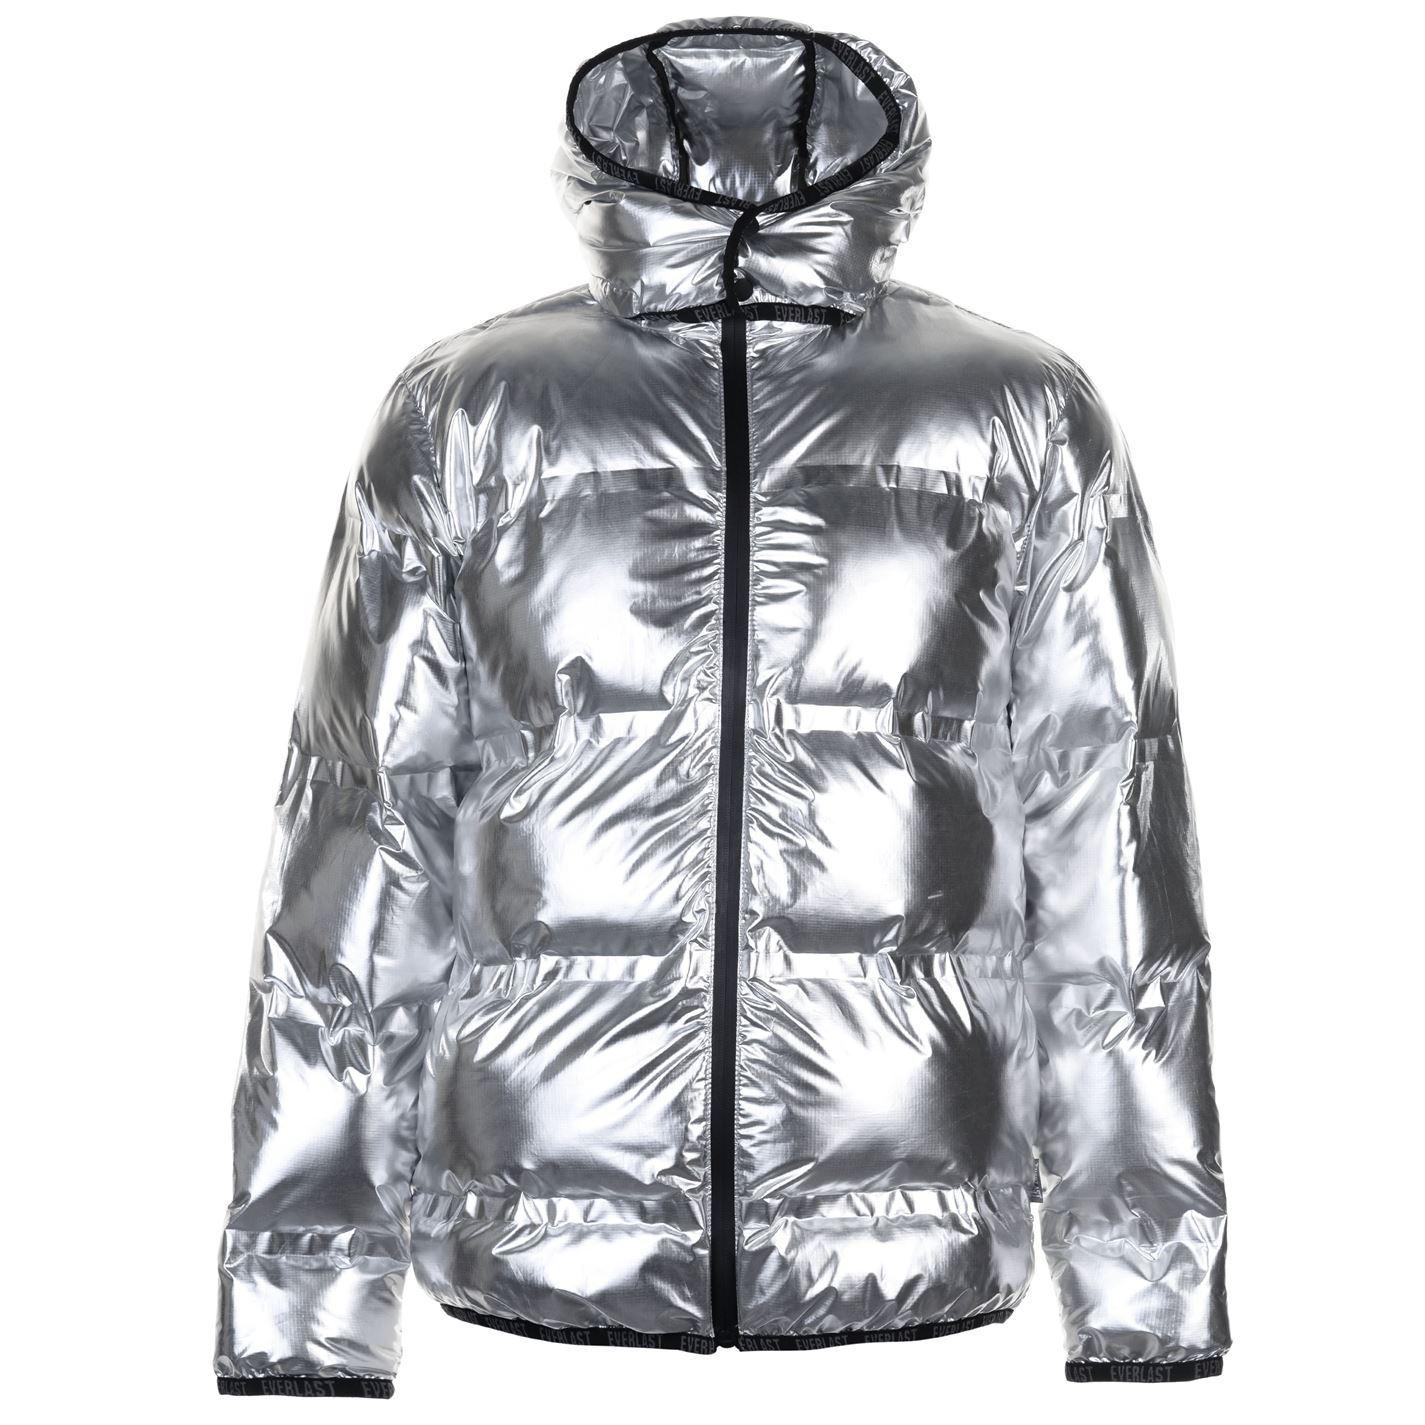 124bc51444 Everlast Mens Bubble Jacket Padded Coat Top Long Sleeve Waterproof ...